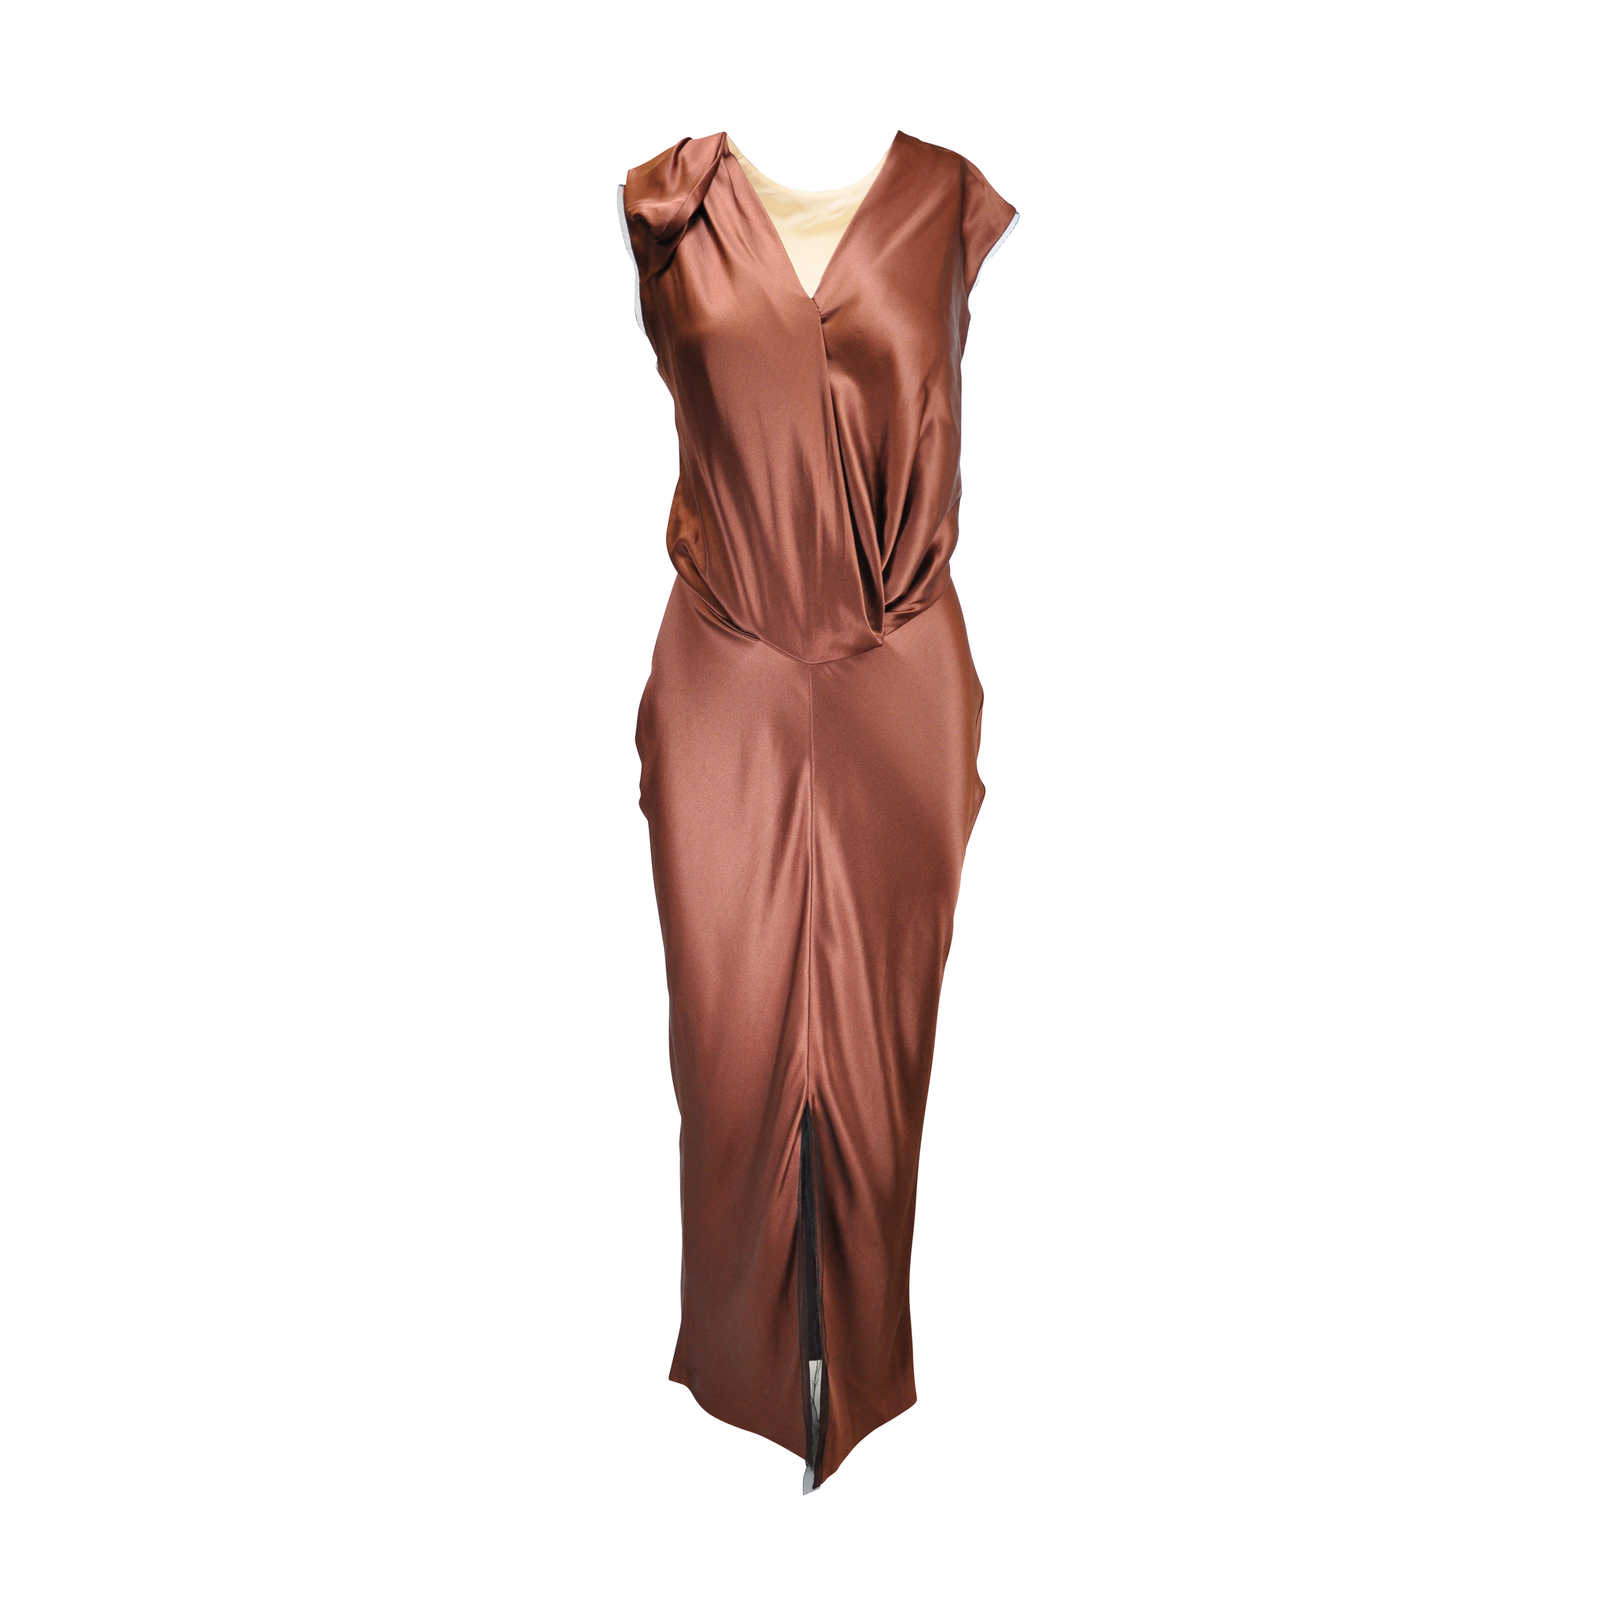 roksanda-ilincic-draped-gown-1.jpg